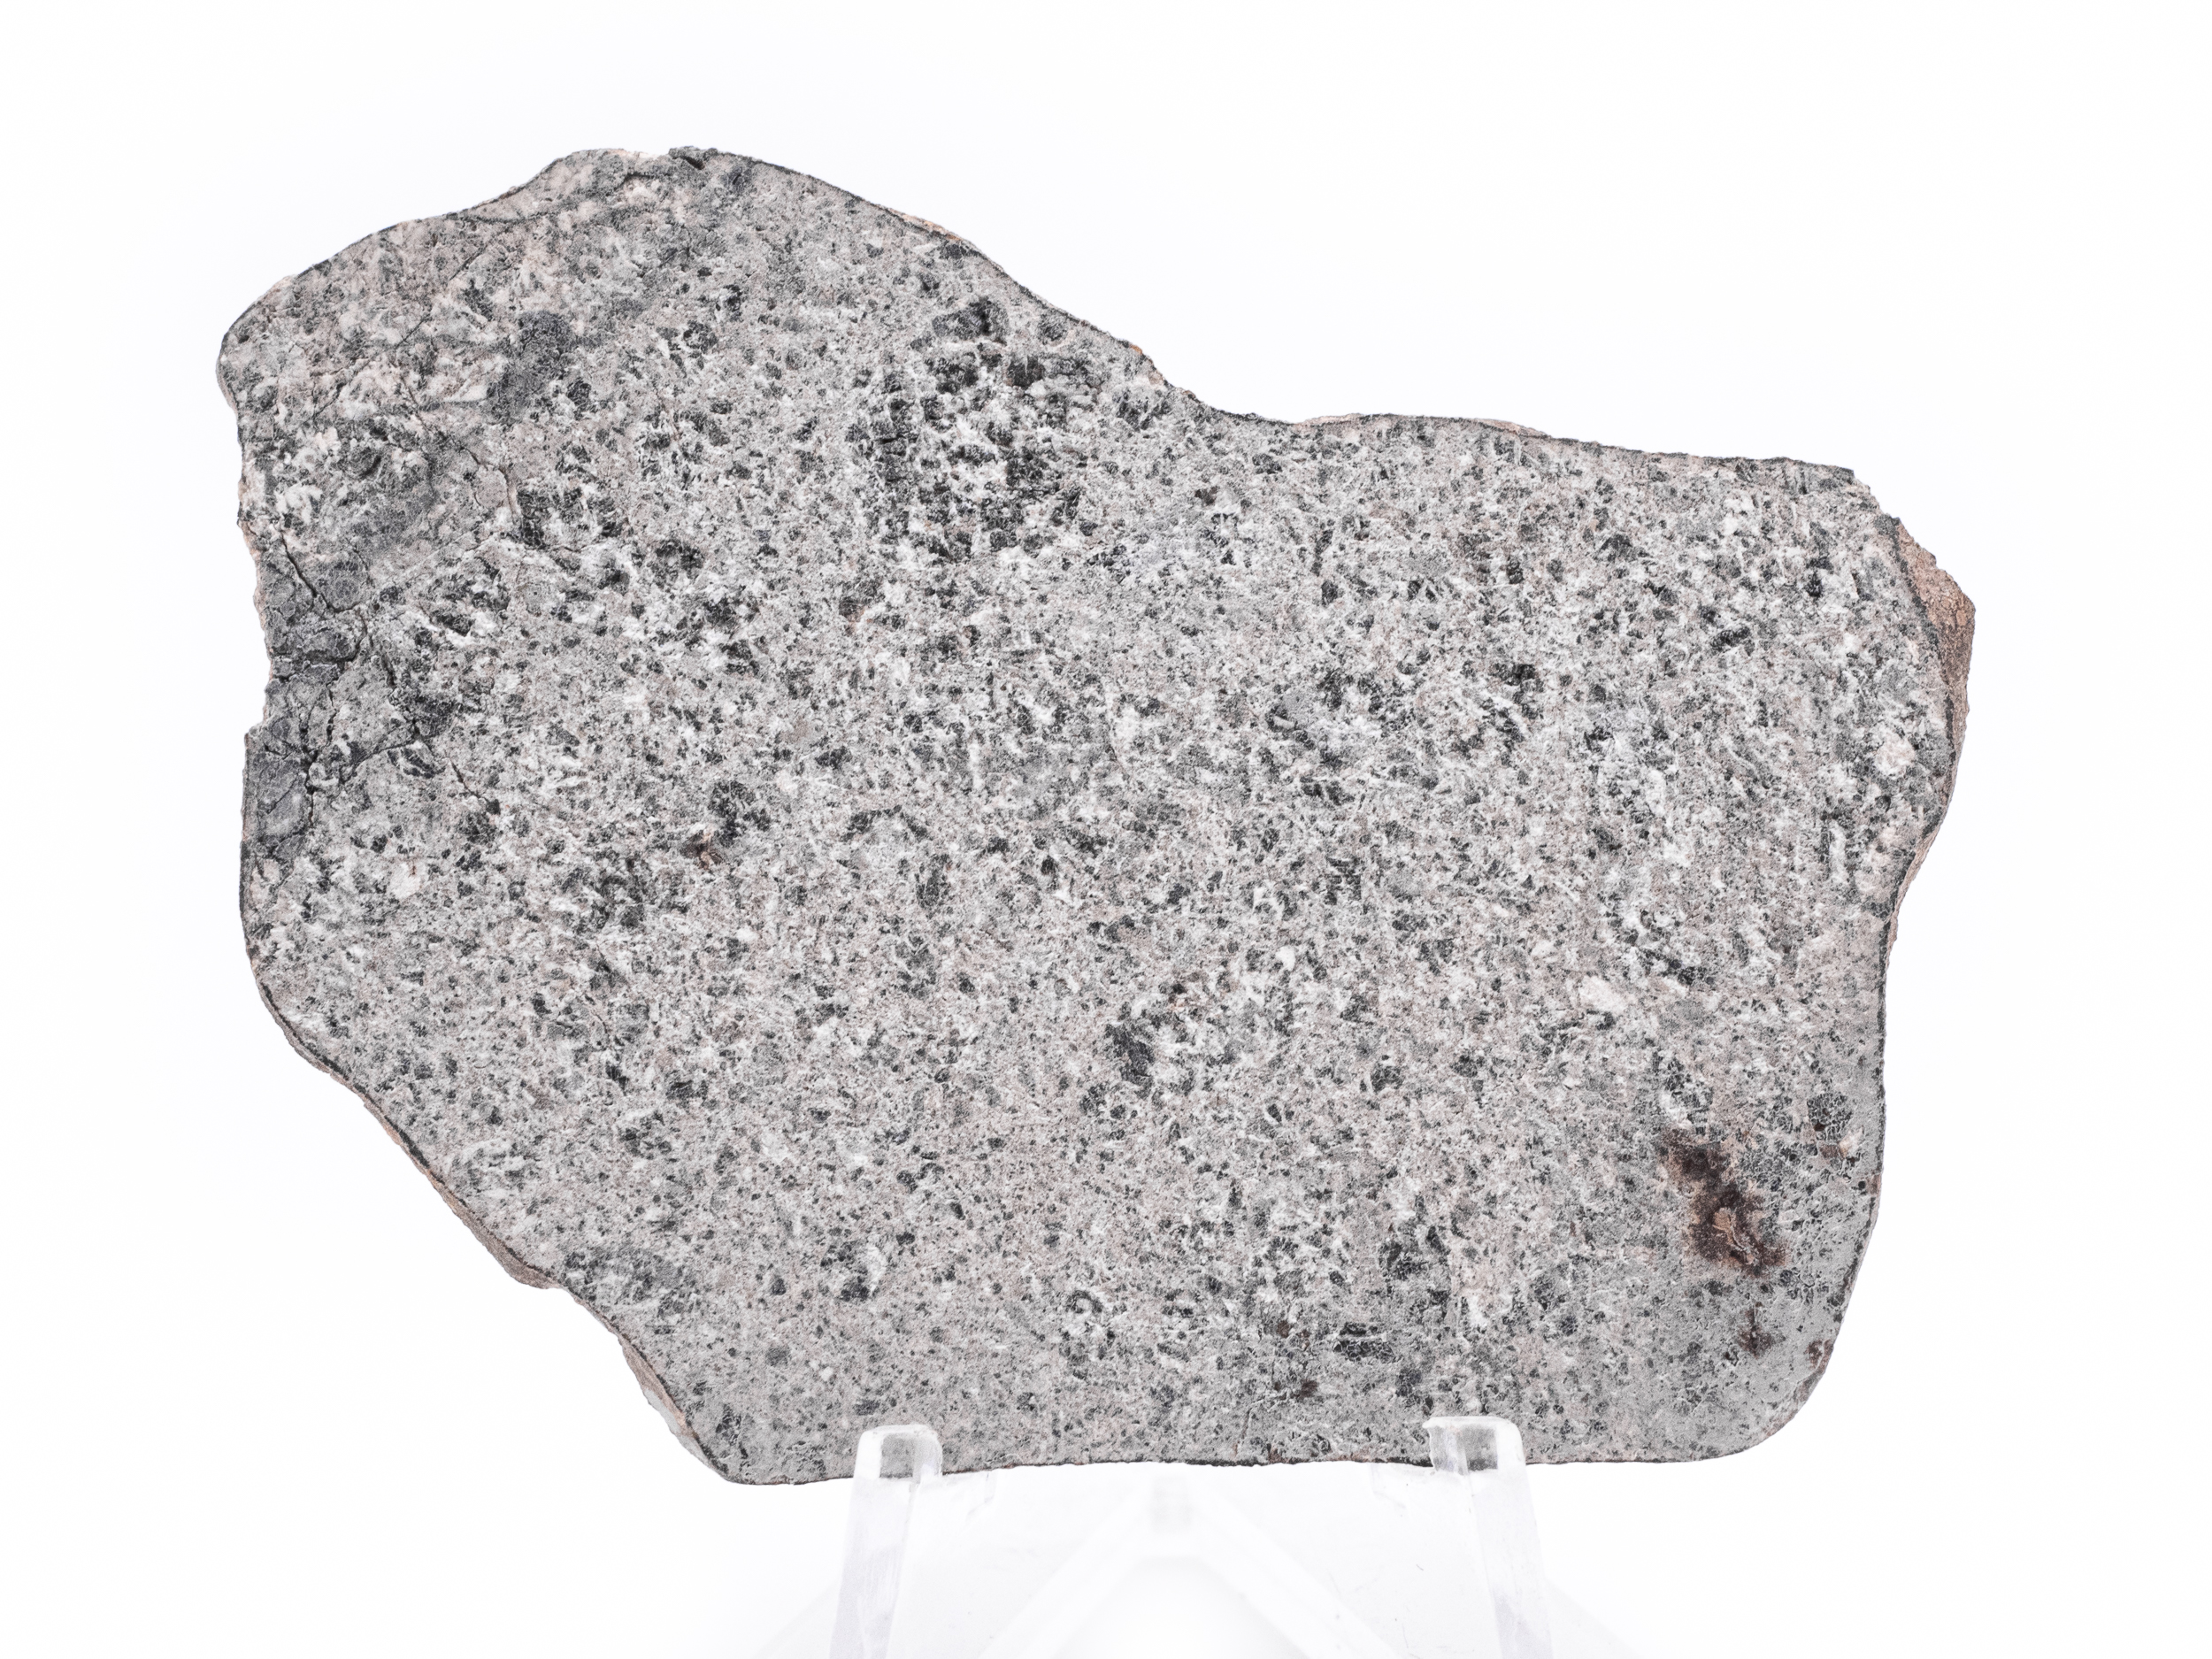 asteroid 4 vesta 12